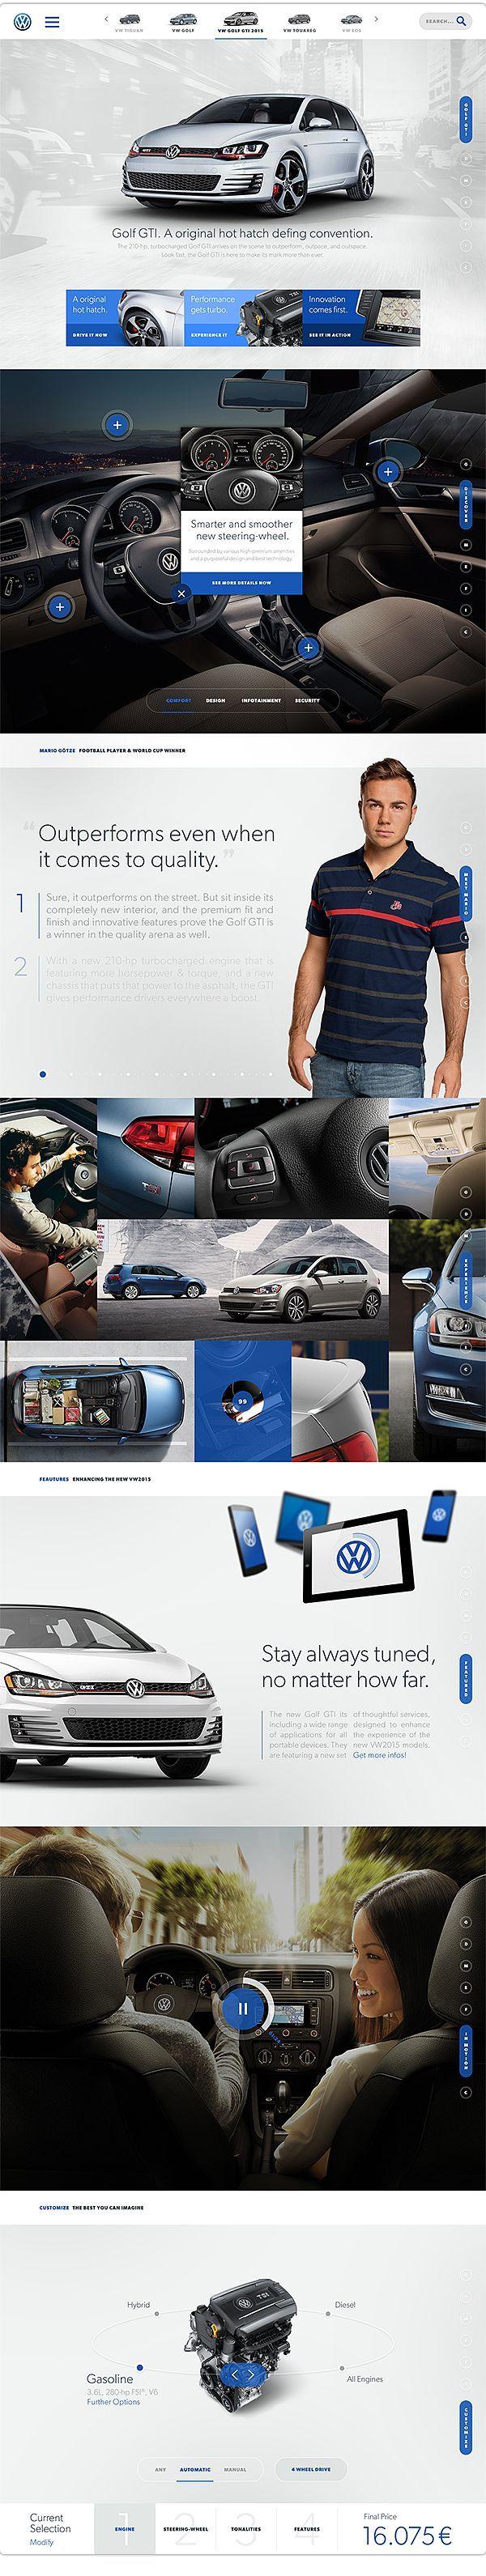 The future of Volkswagen by Oriol Bedia is 2otsu